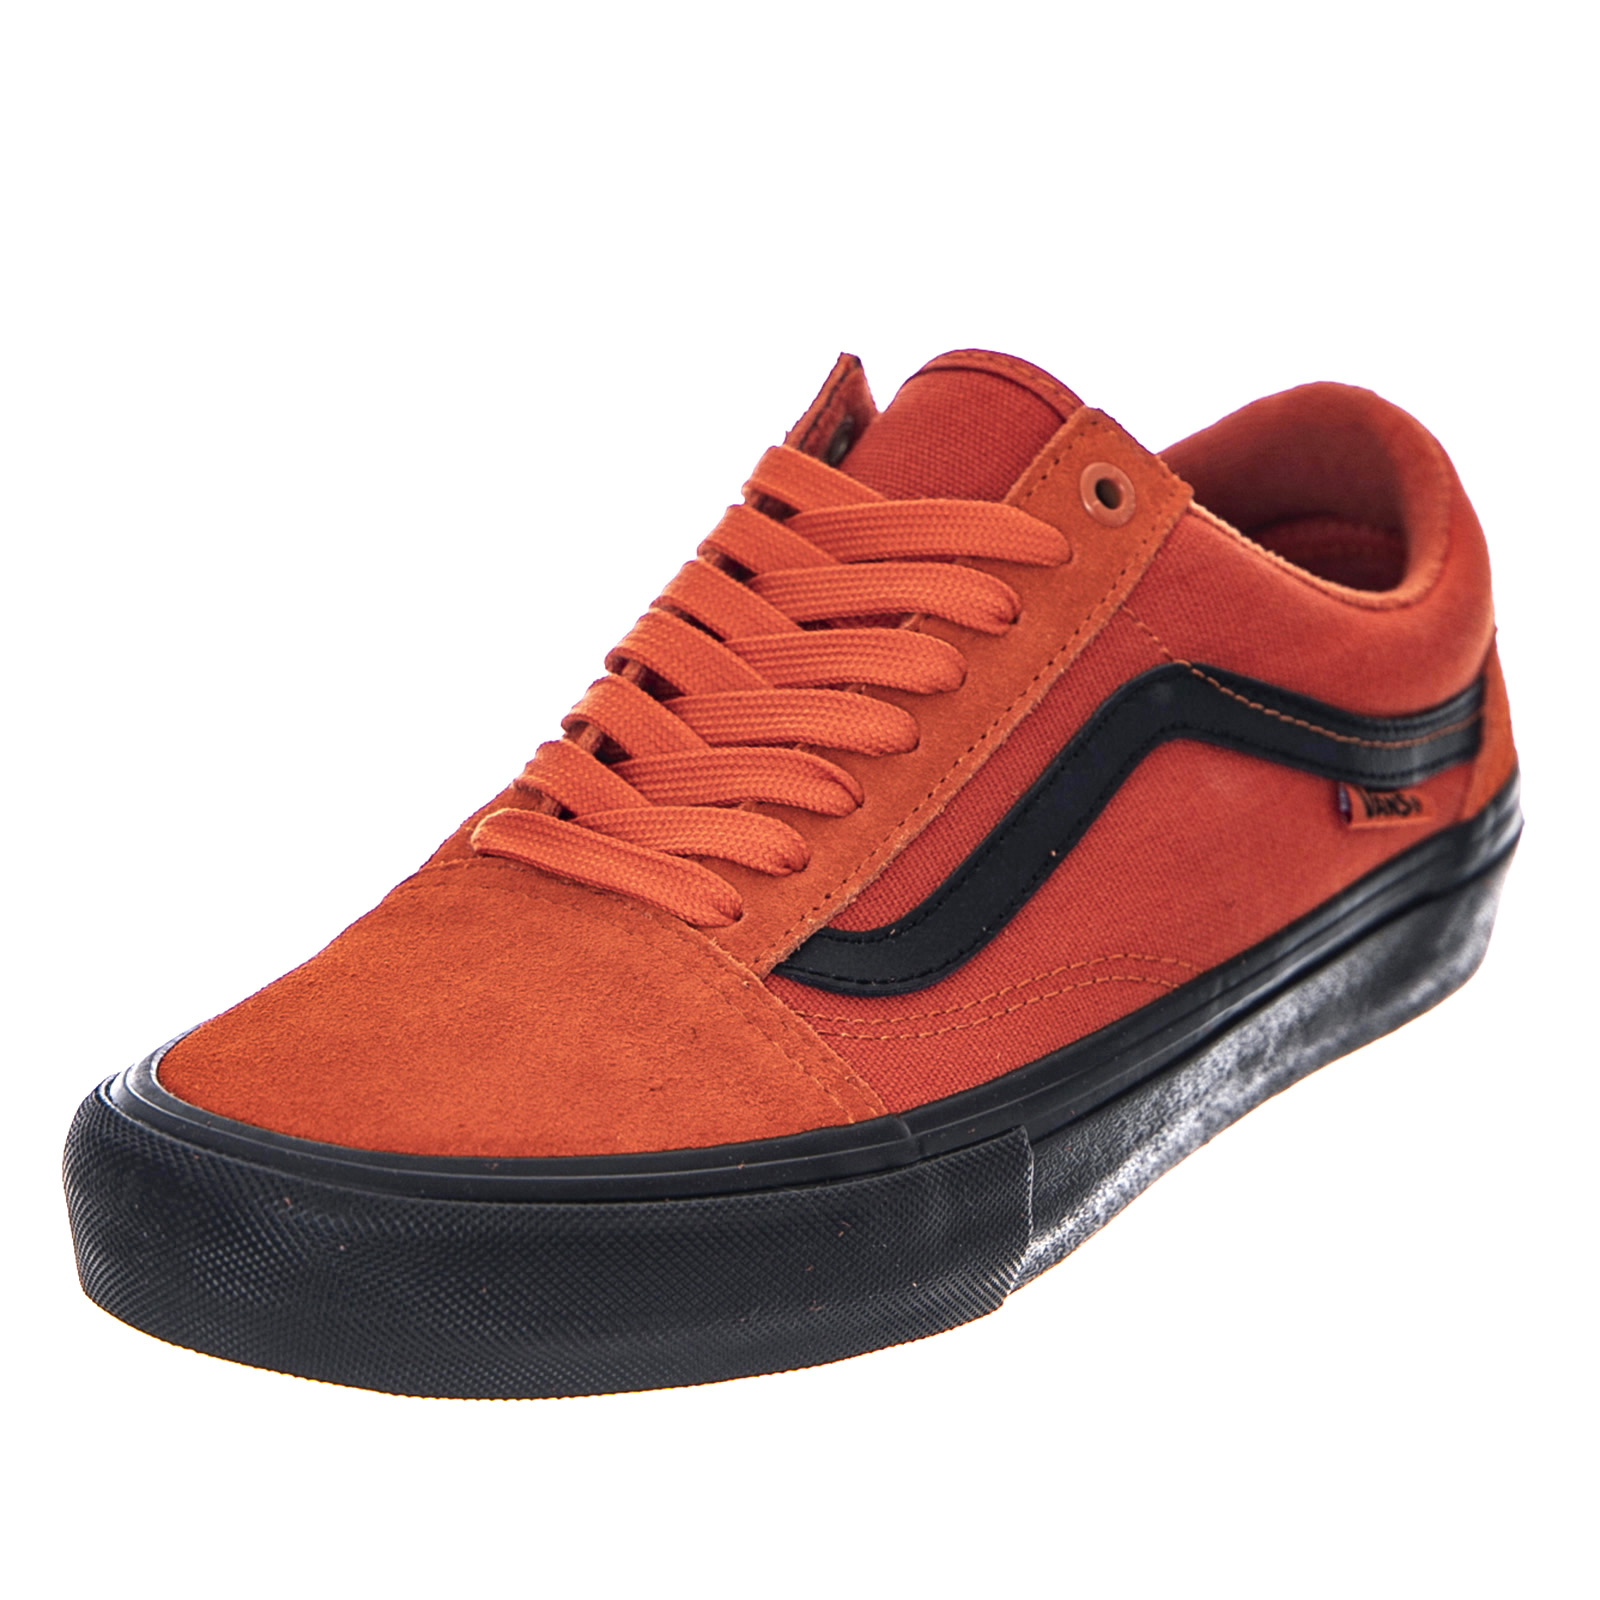 Details zu Vans Mn Old Skool pro - Koi / Black - Turnschuhe Niedrig Herren Orange